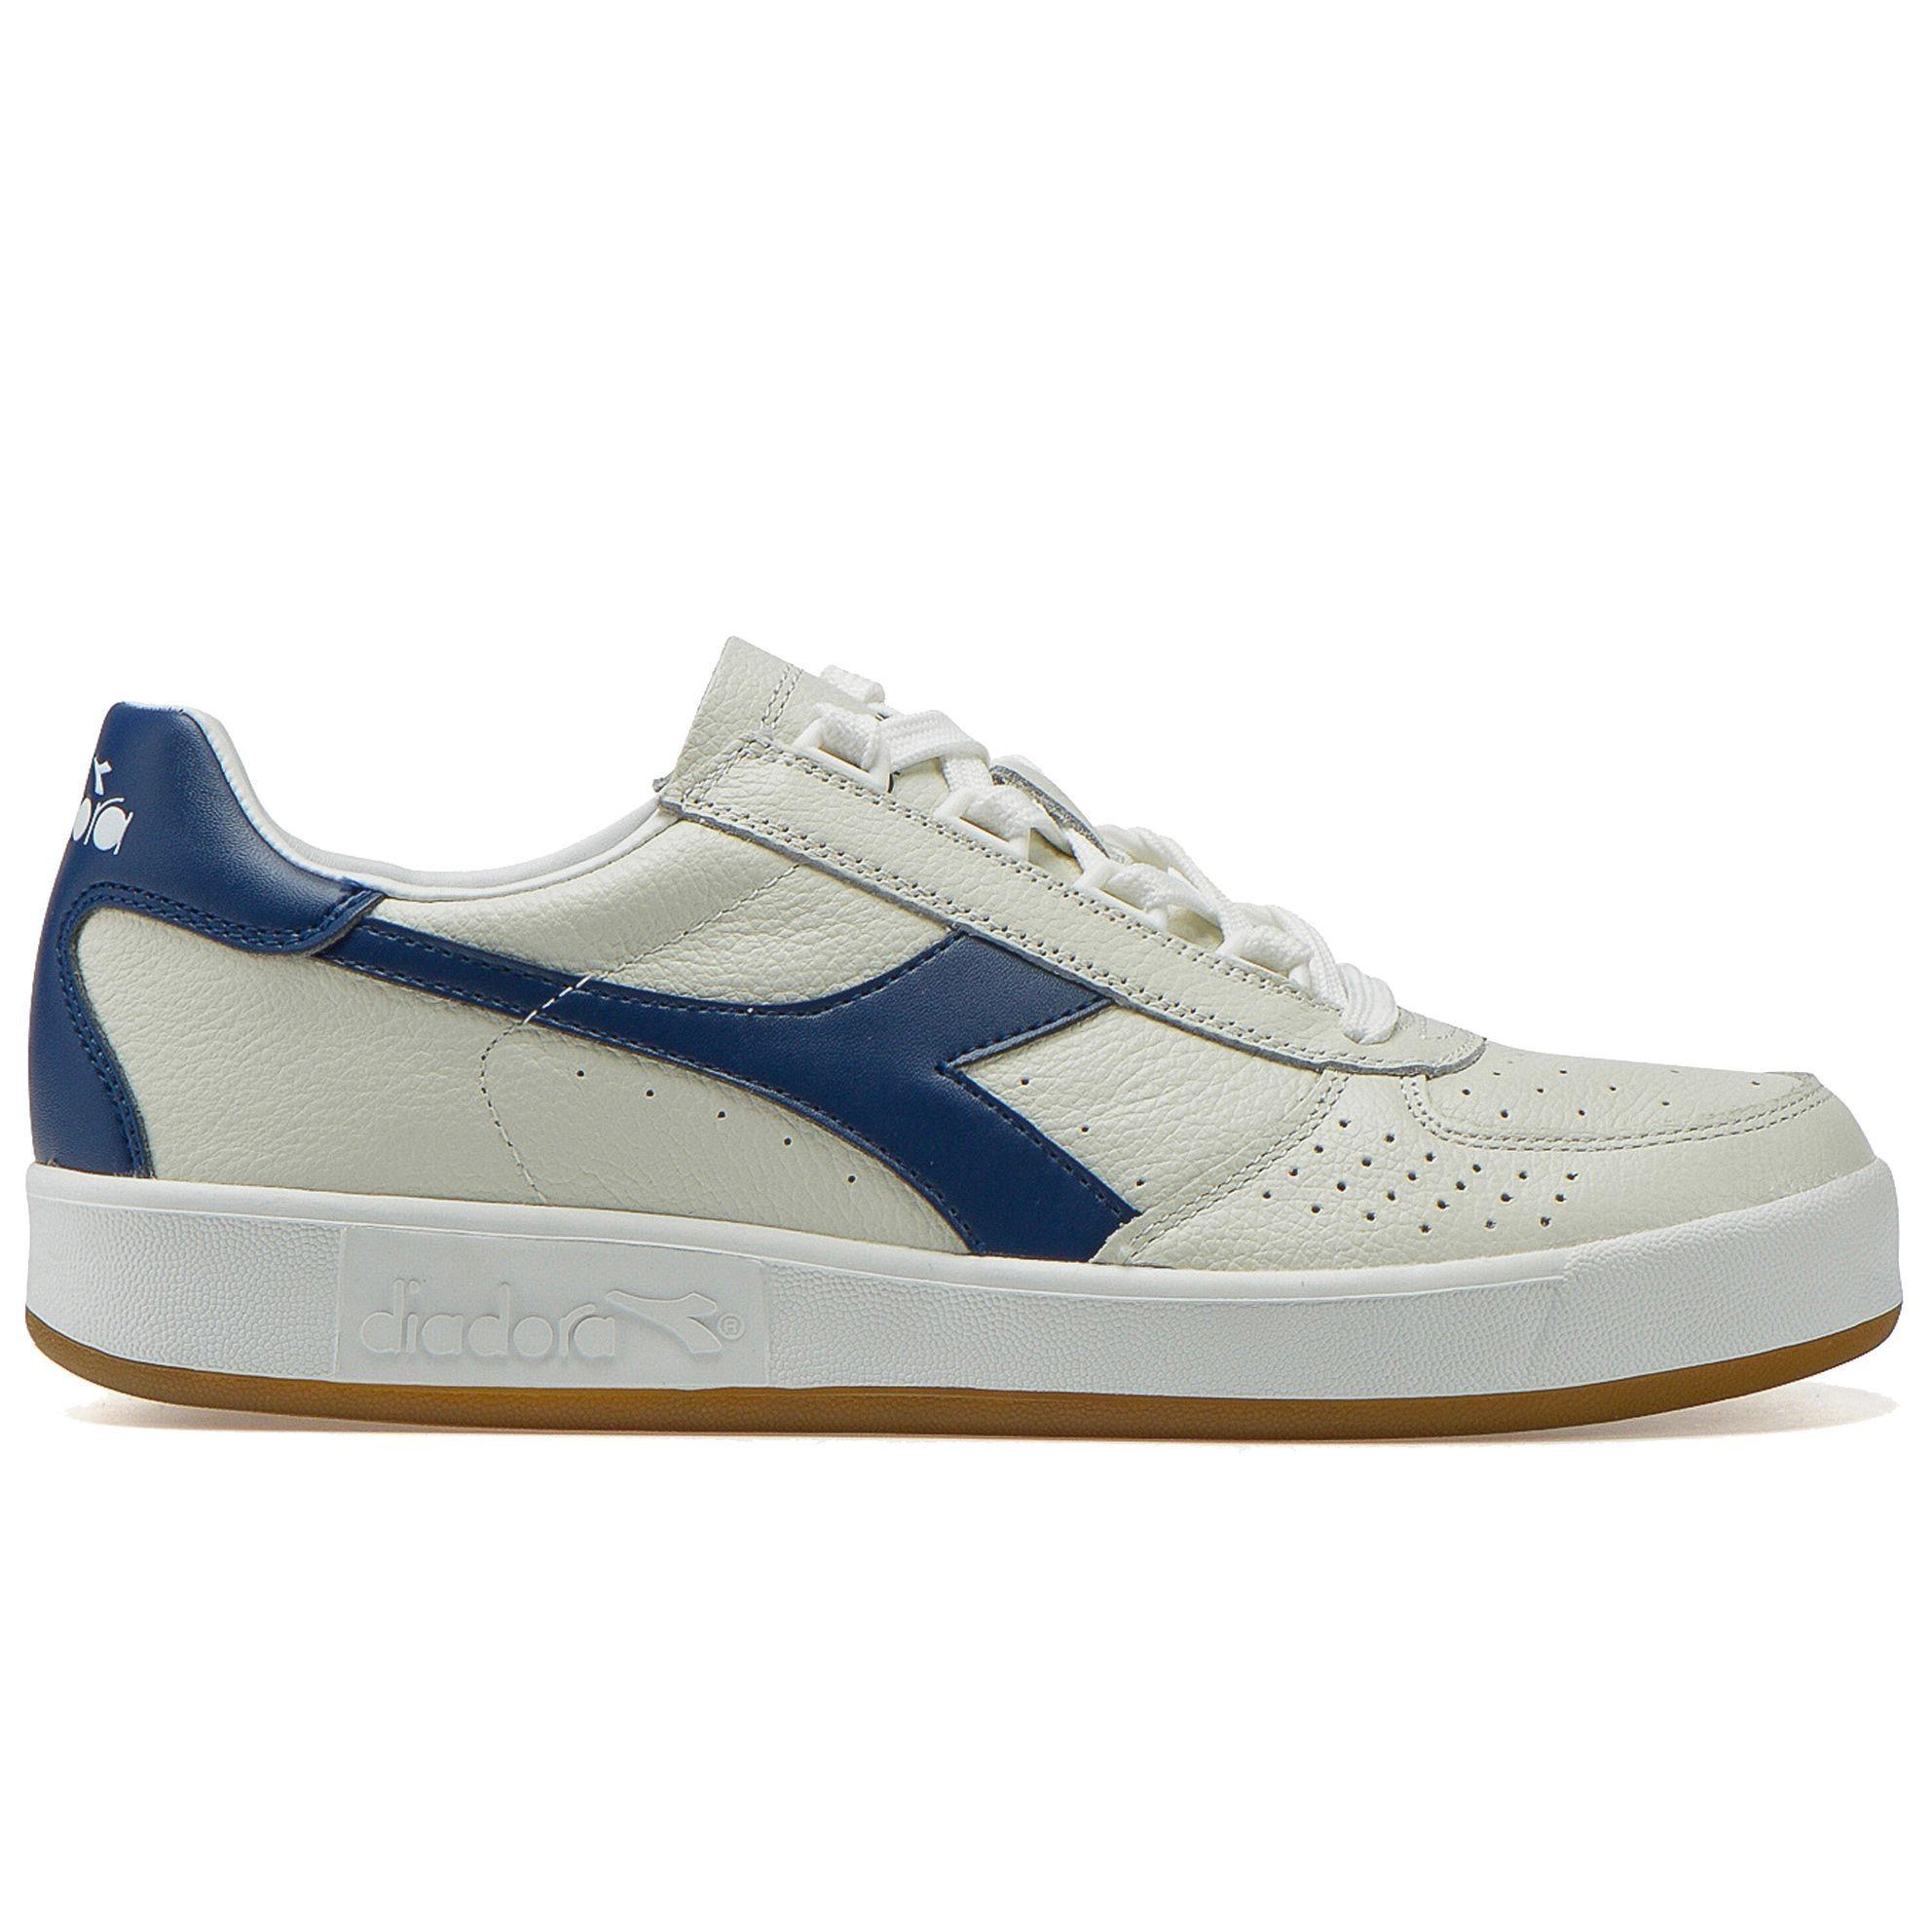 Nouvelle basket diadora blanche et bleu 1010655.25y